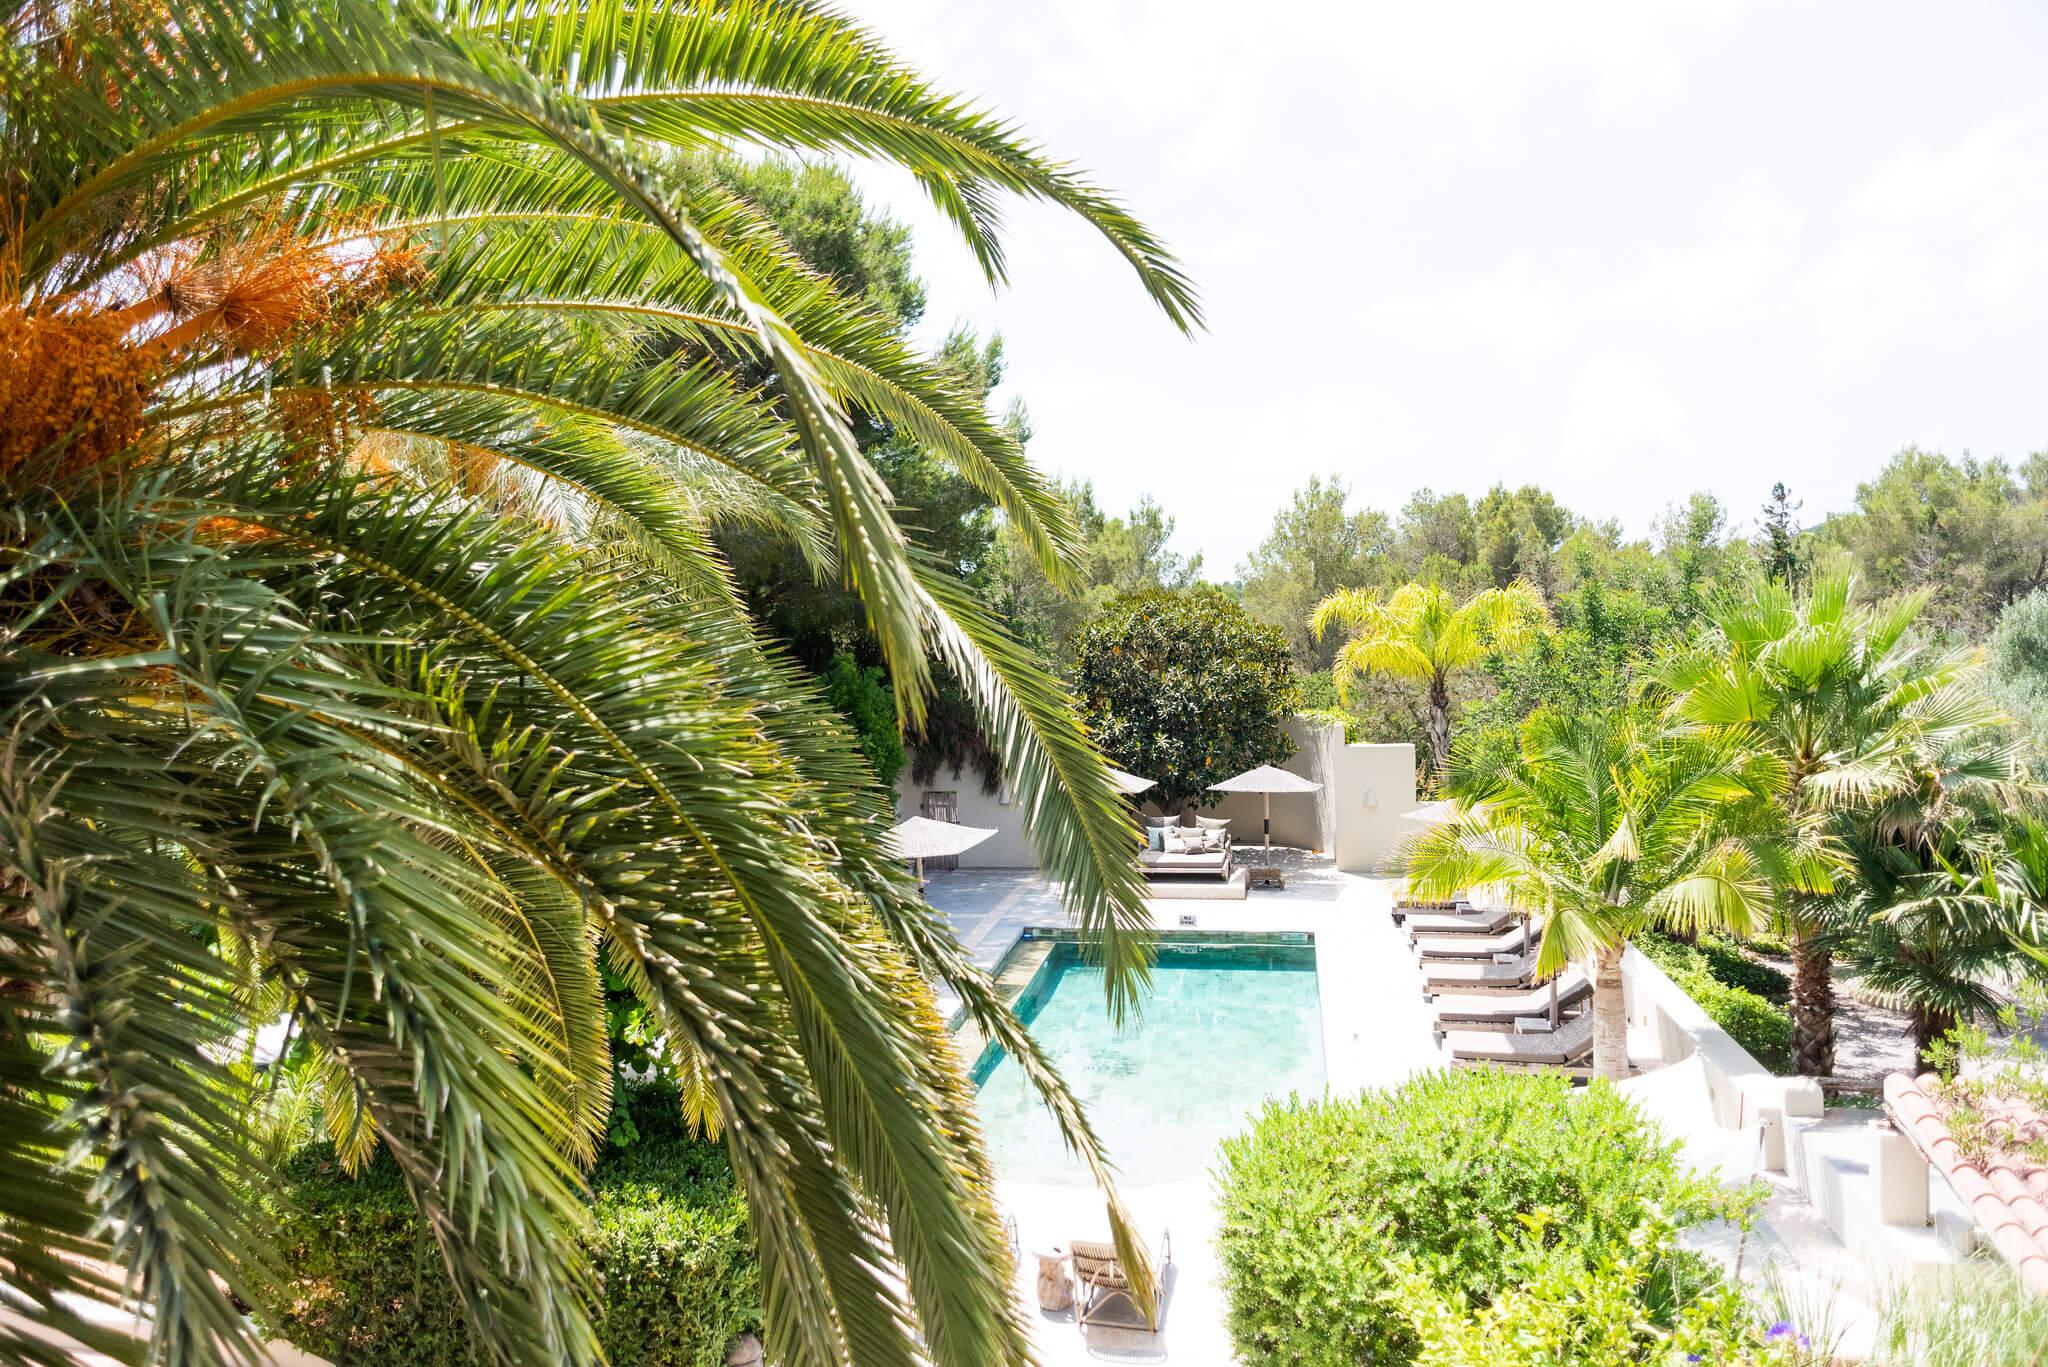 https://www.white-ibiza.com/wp-content/uploads/2020/05/white-ibiza-villas-can-riviere-interior-view-from-master.jpg